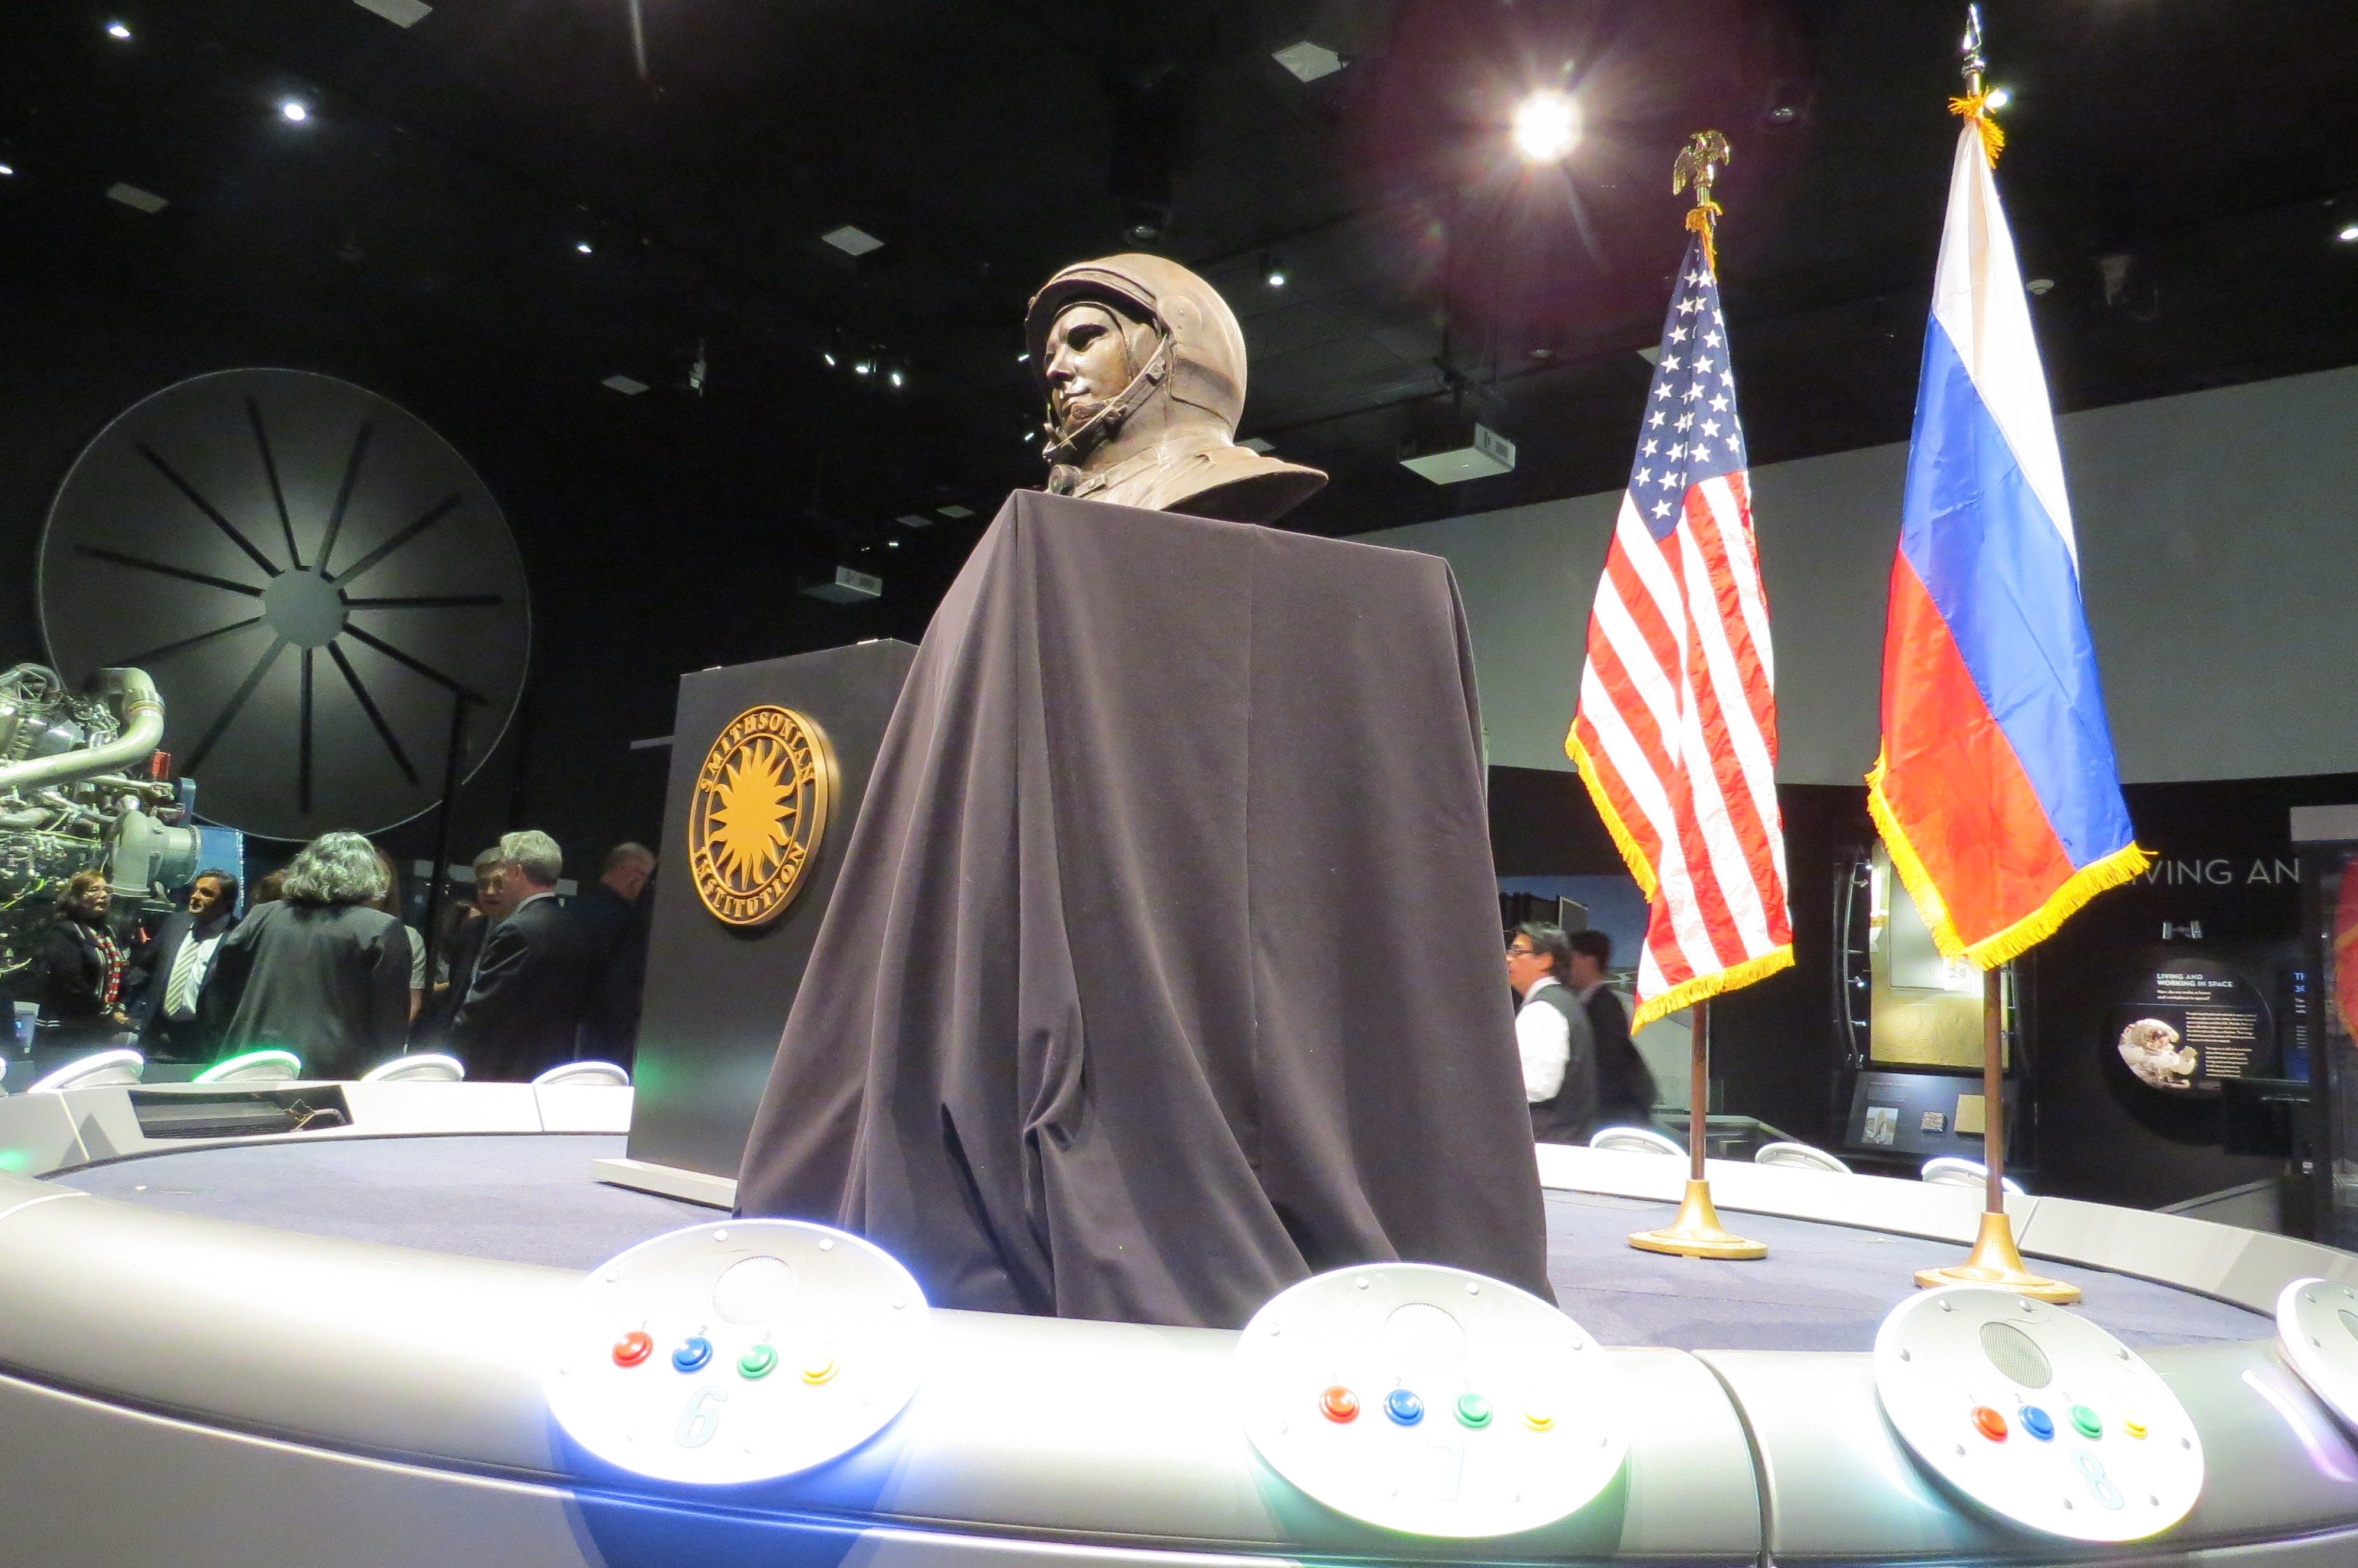 Gagarin Bust, Air and Space Museum, Washington, DC